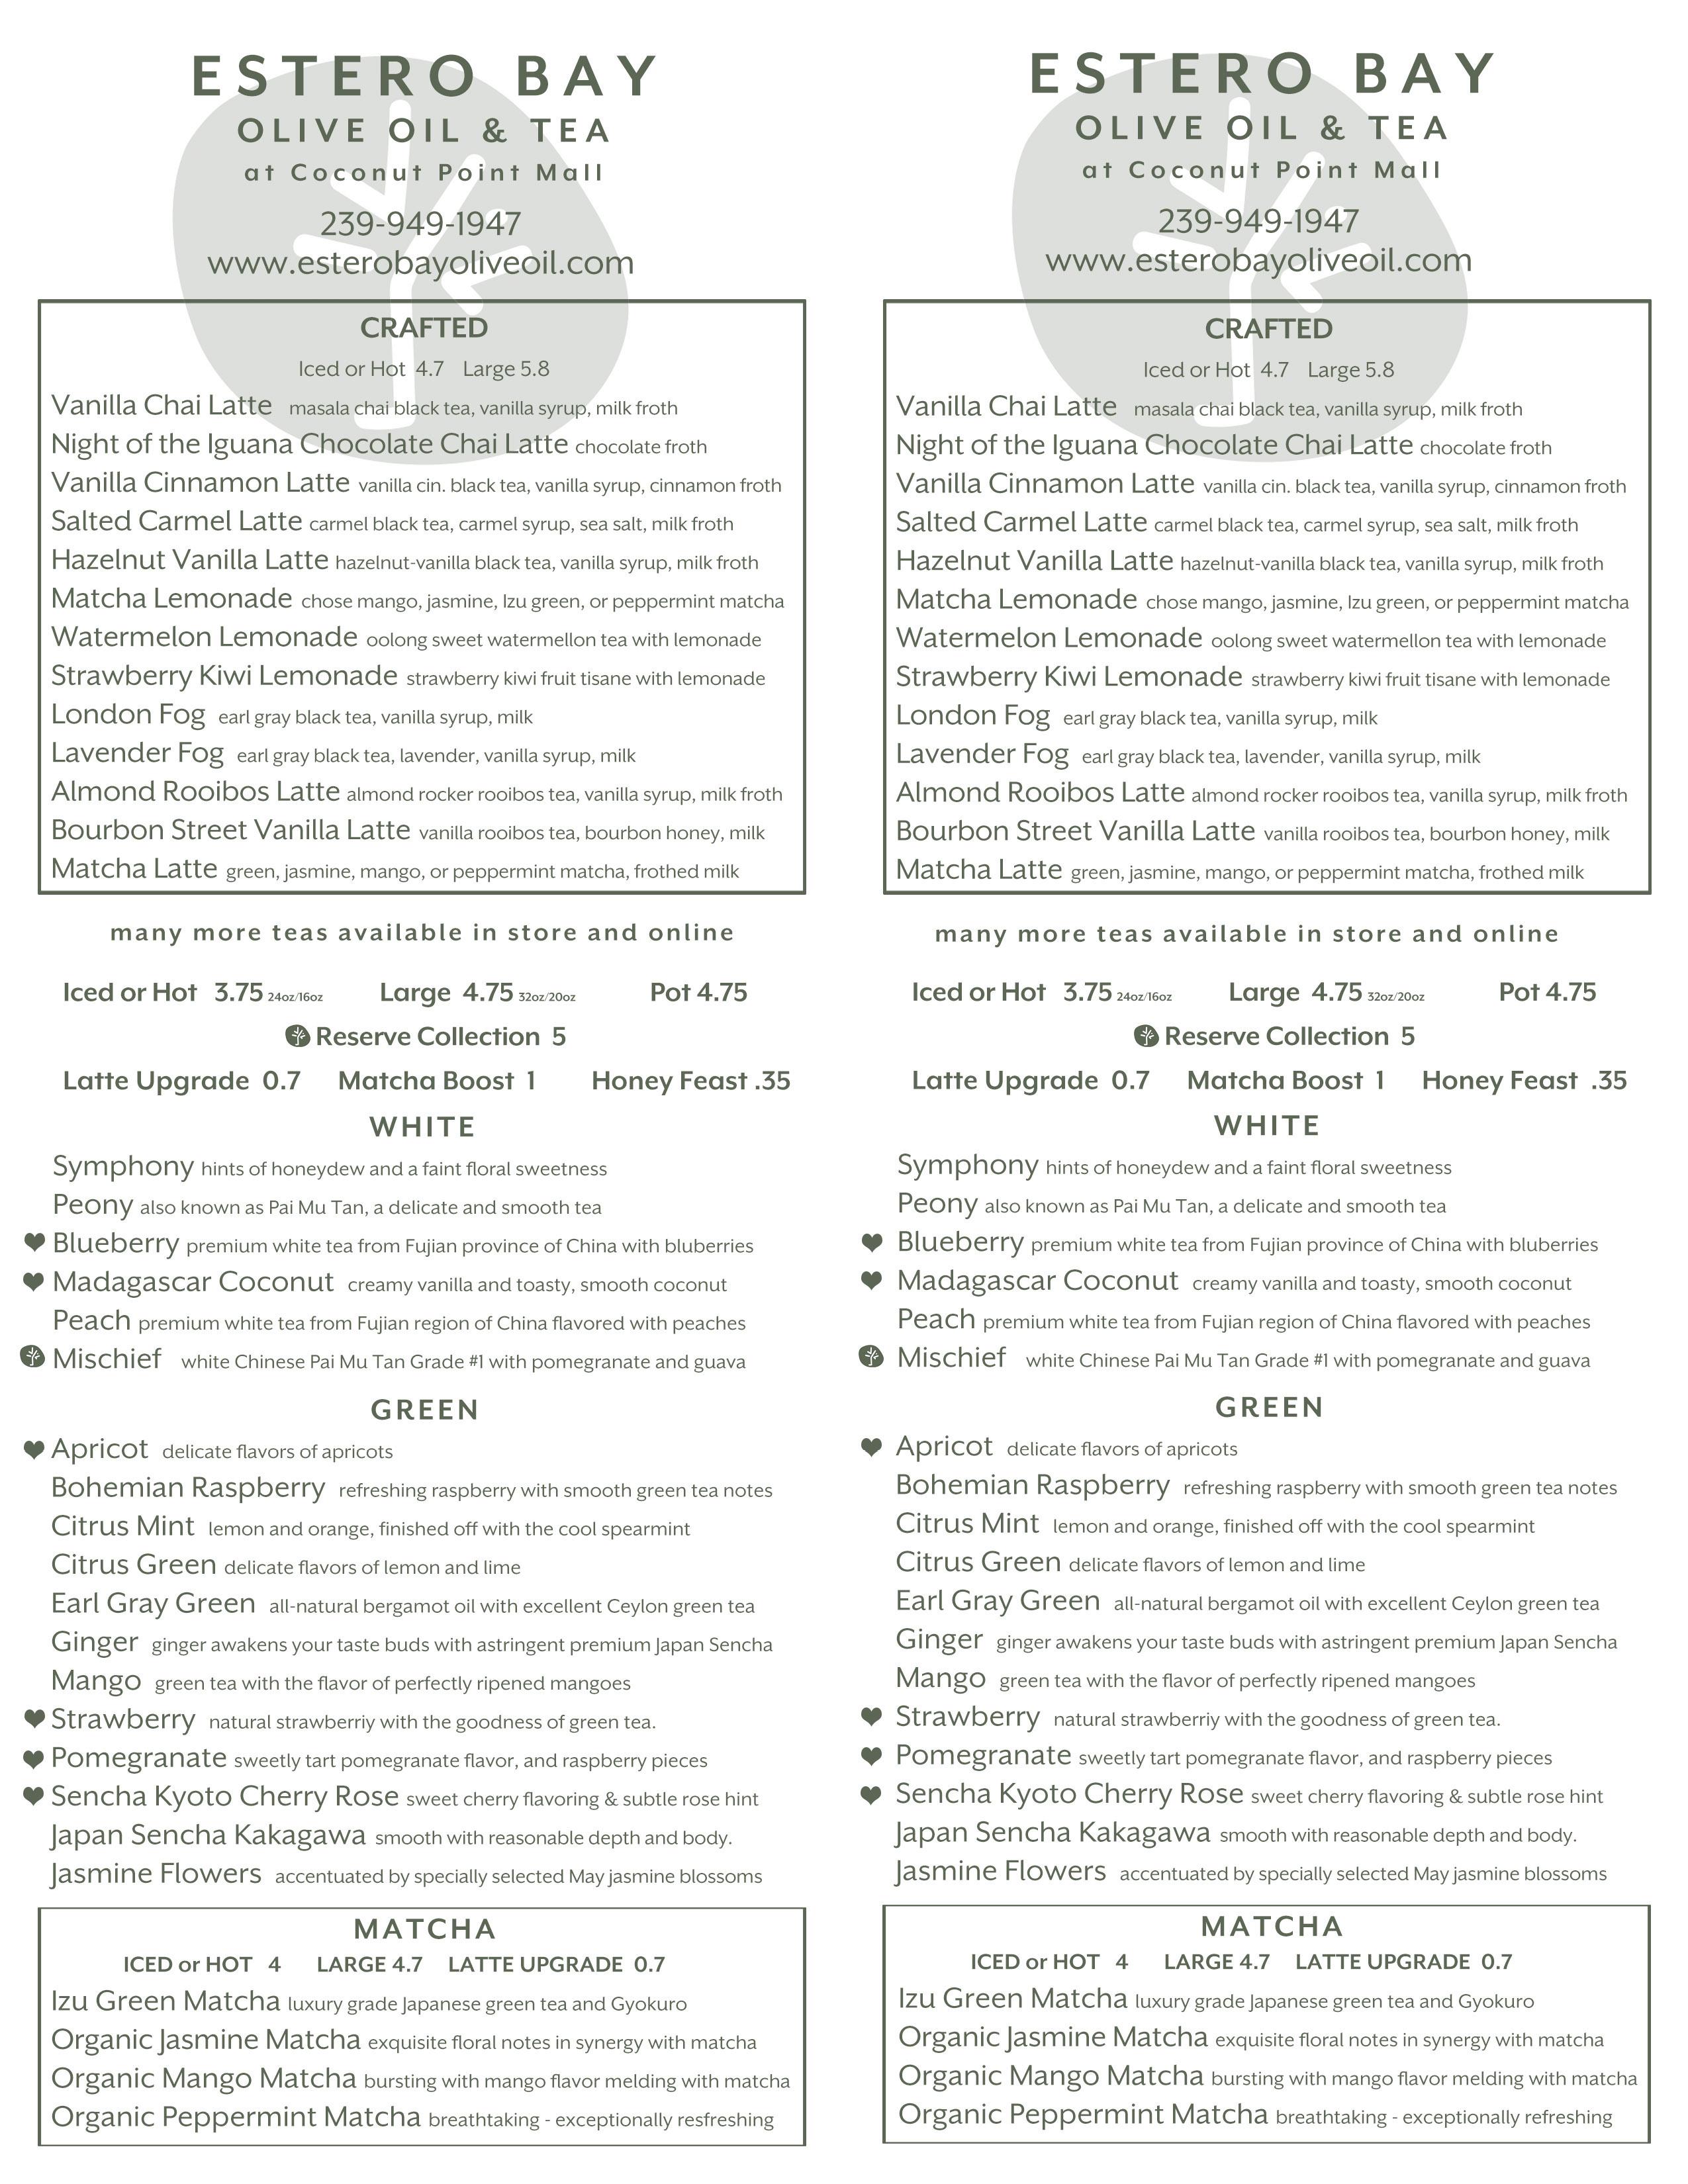 tea-menu-11-5-2019-1.jpg